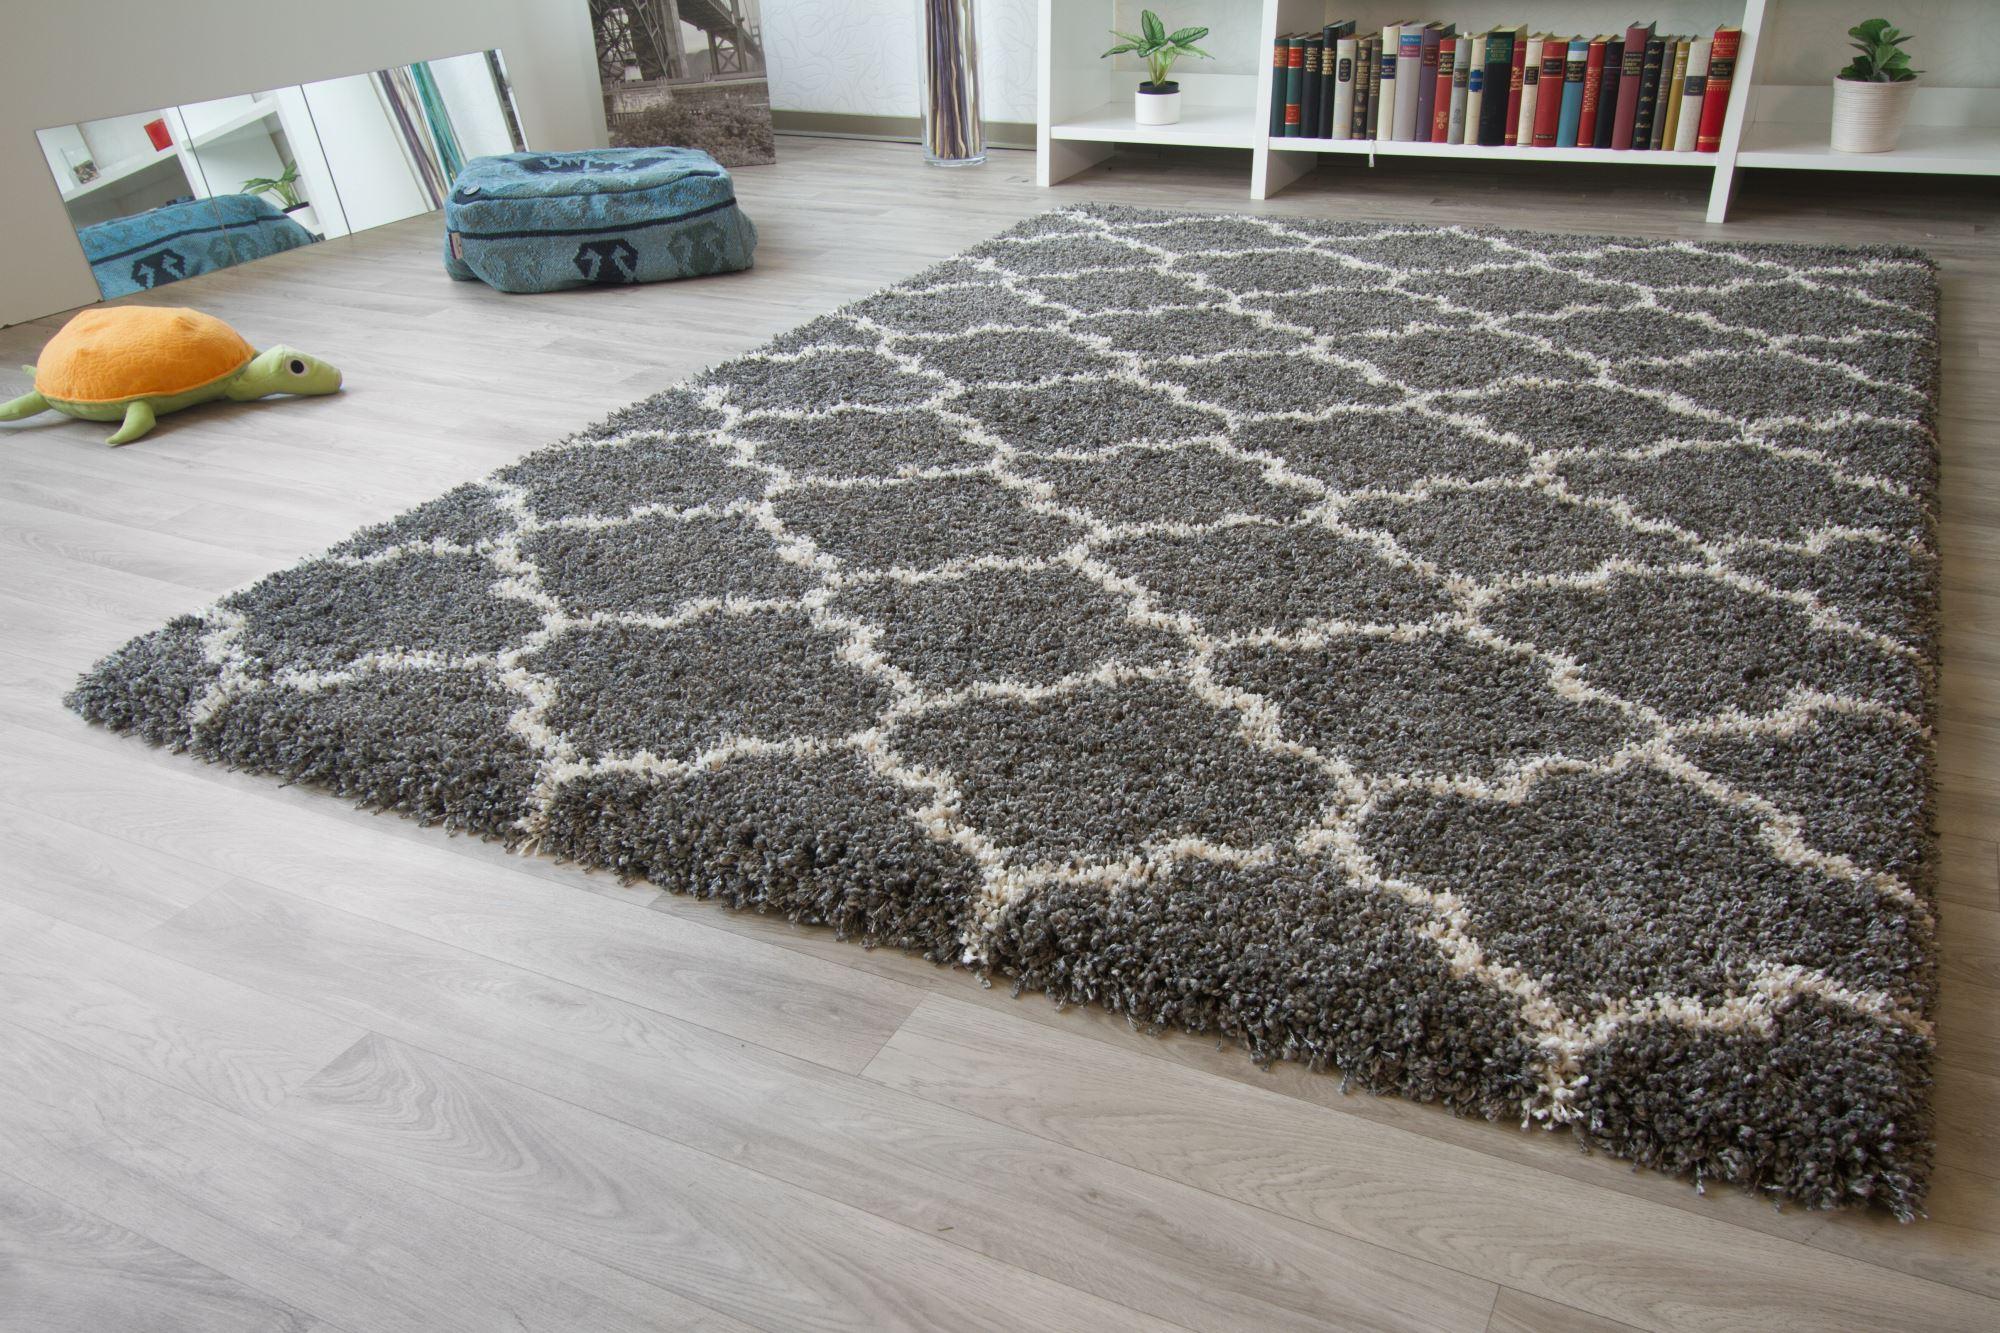 designer teppich modern marrakesch berber style raute floral neu ebay. Black Bedroom Furniture Sets. Home Design Ideas